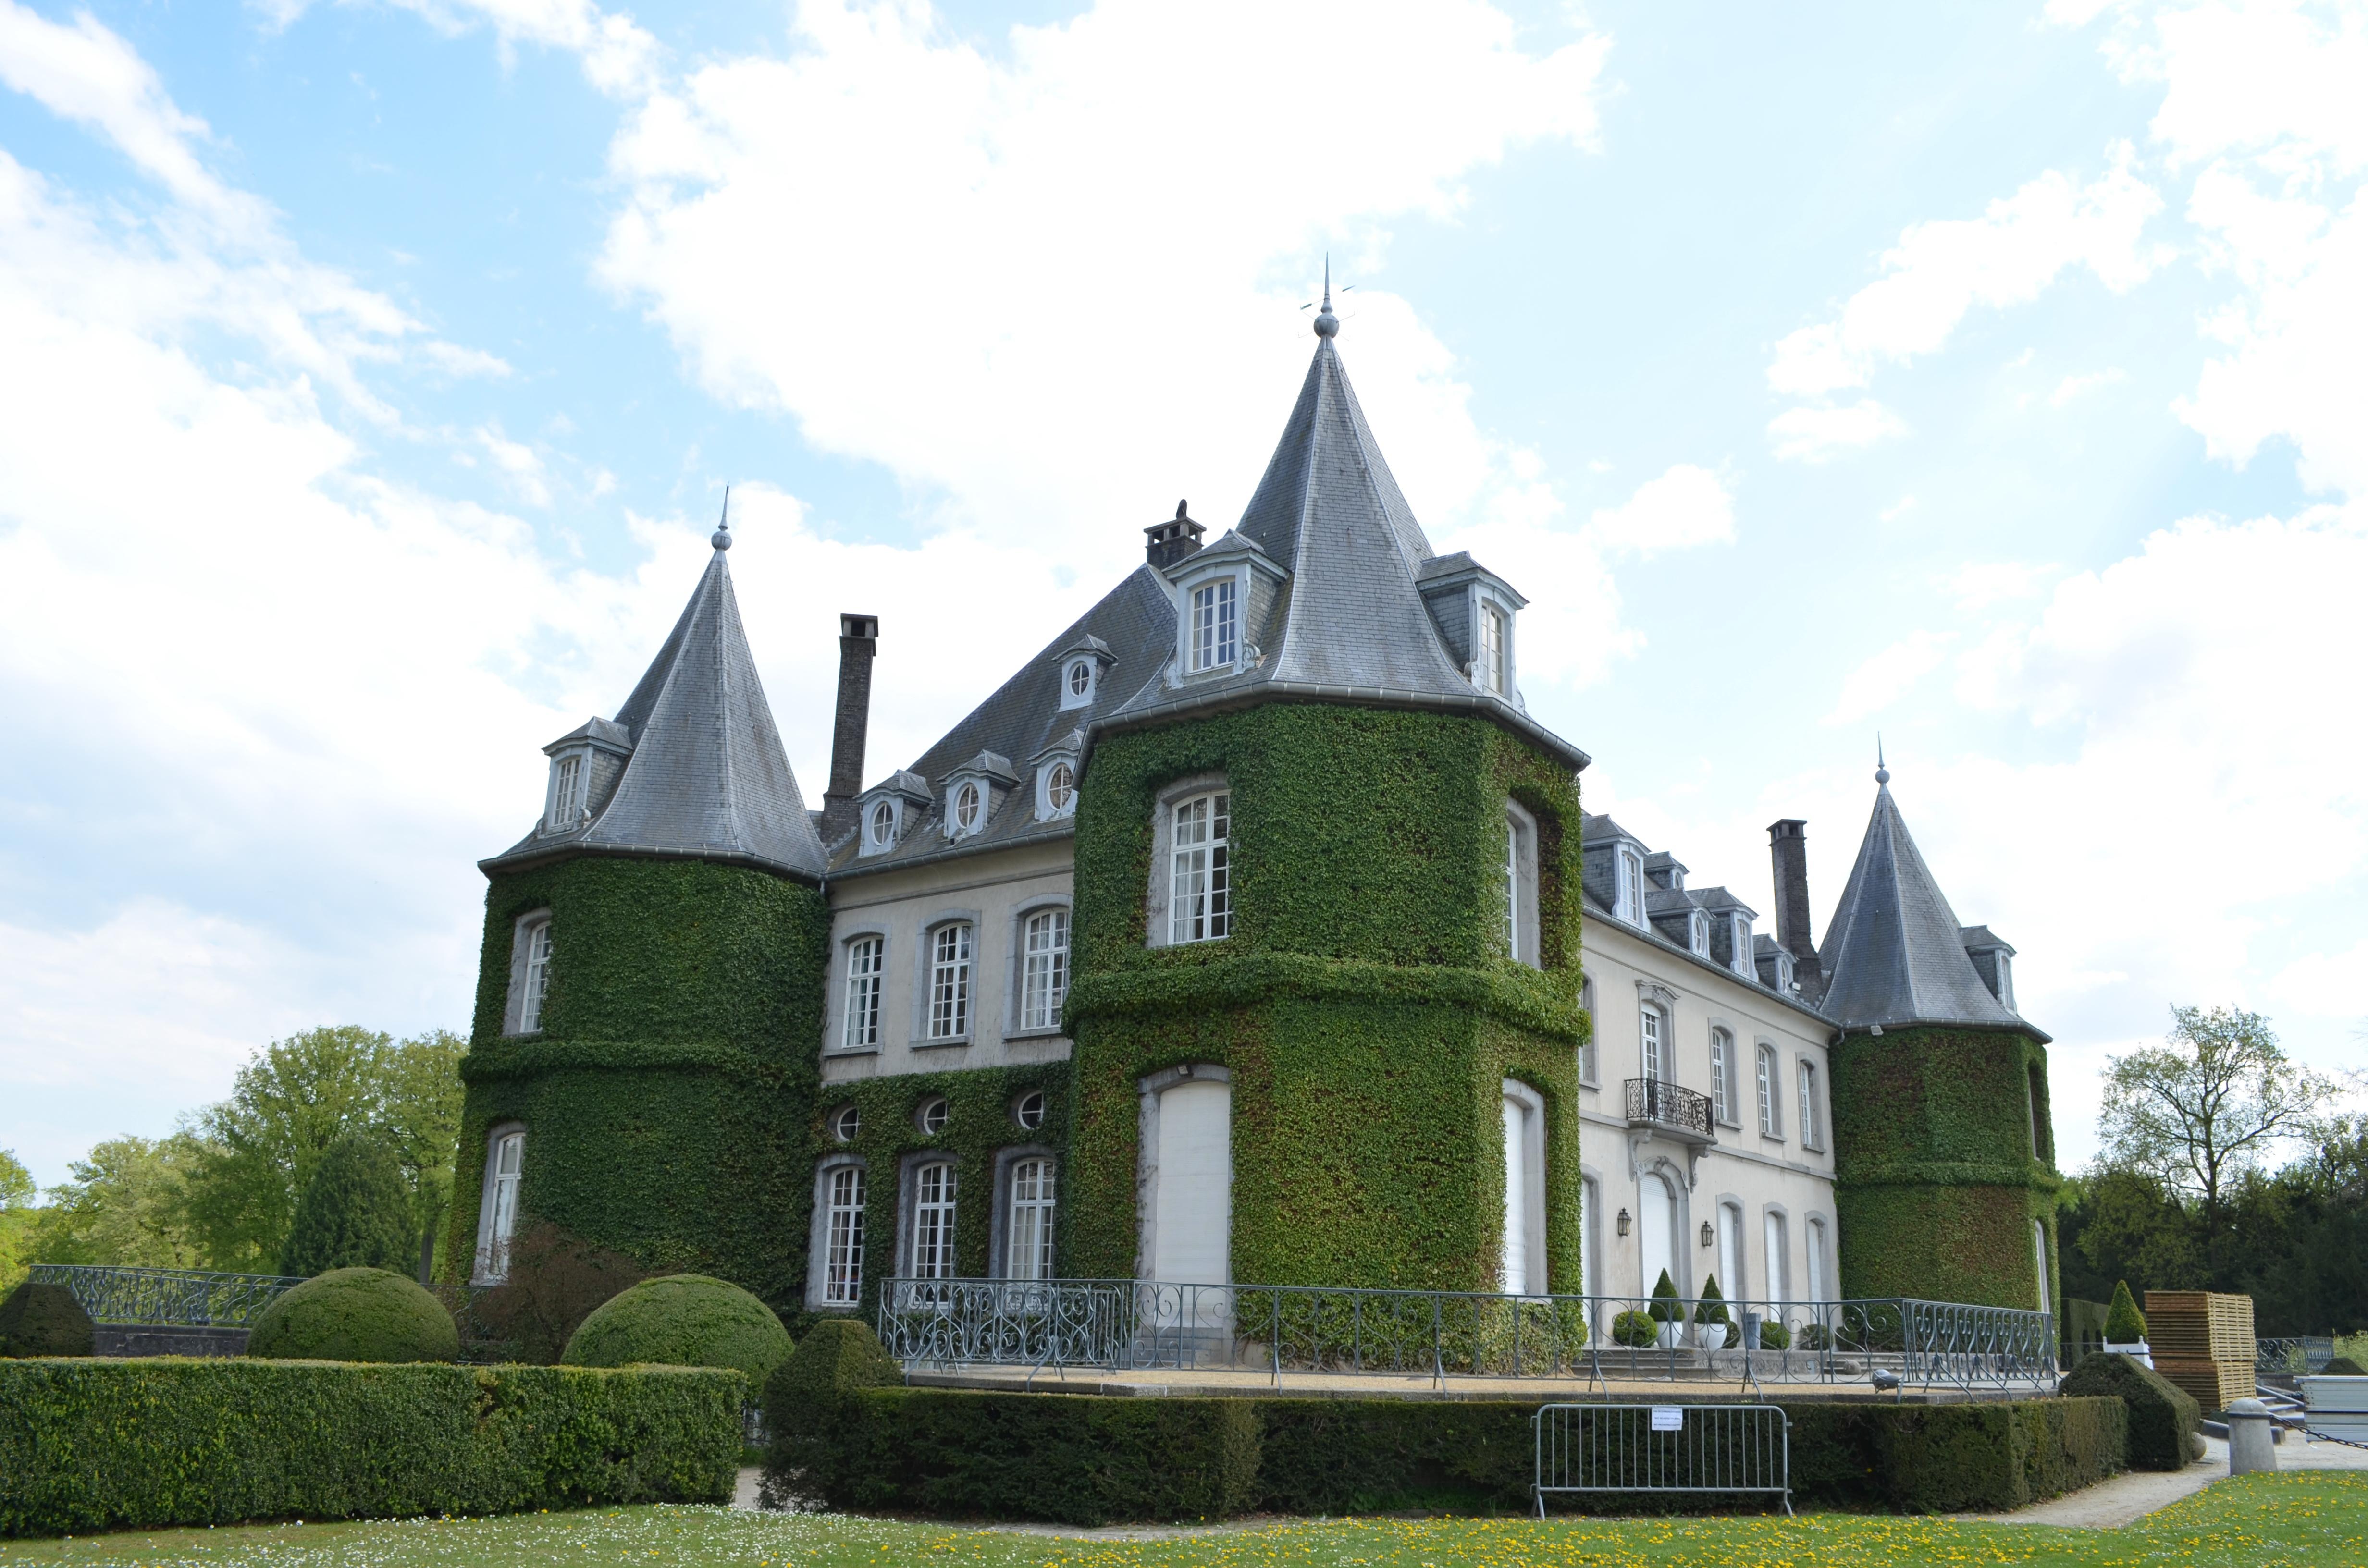 Laure_Van_De_Meele_photo_originale_du_Château_de_la_Hulpe_B